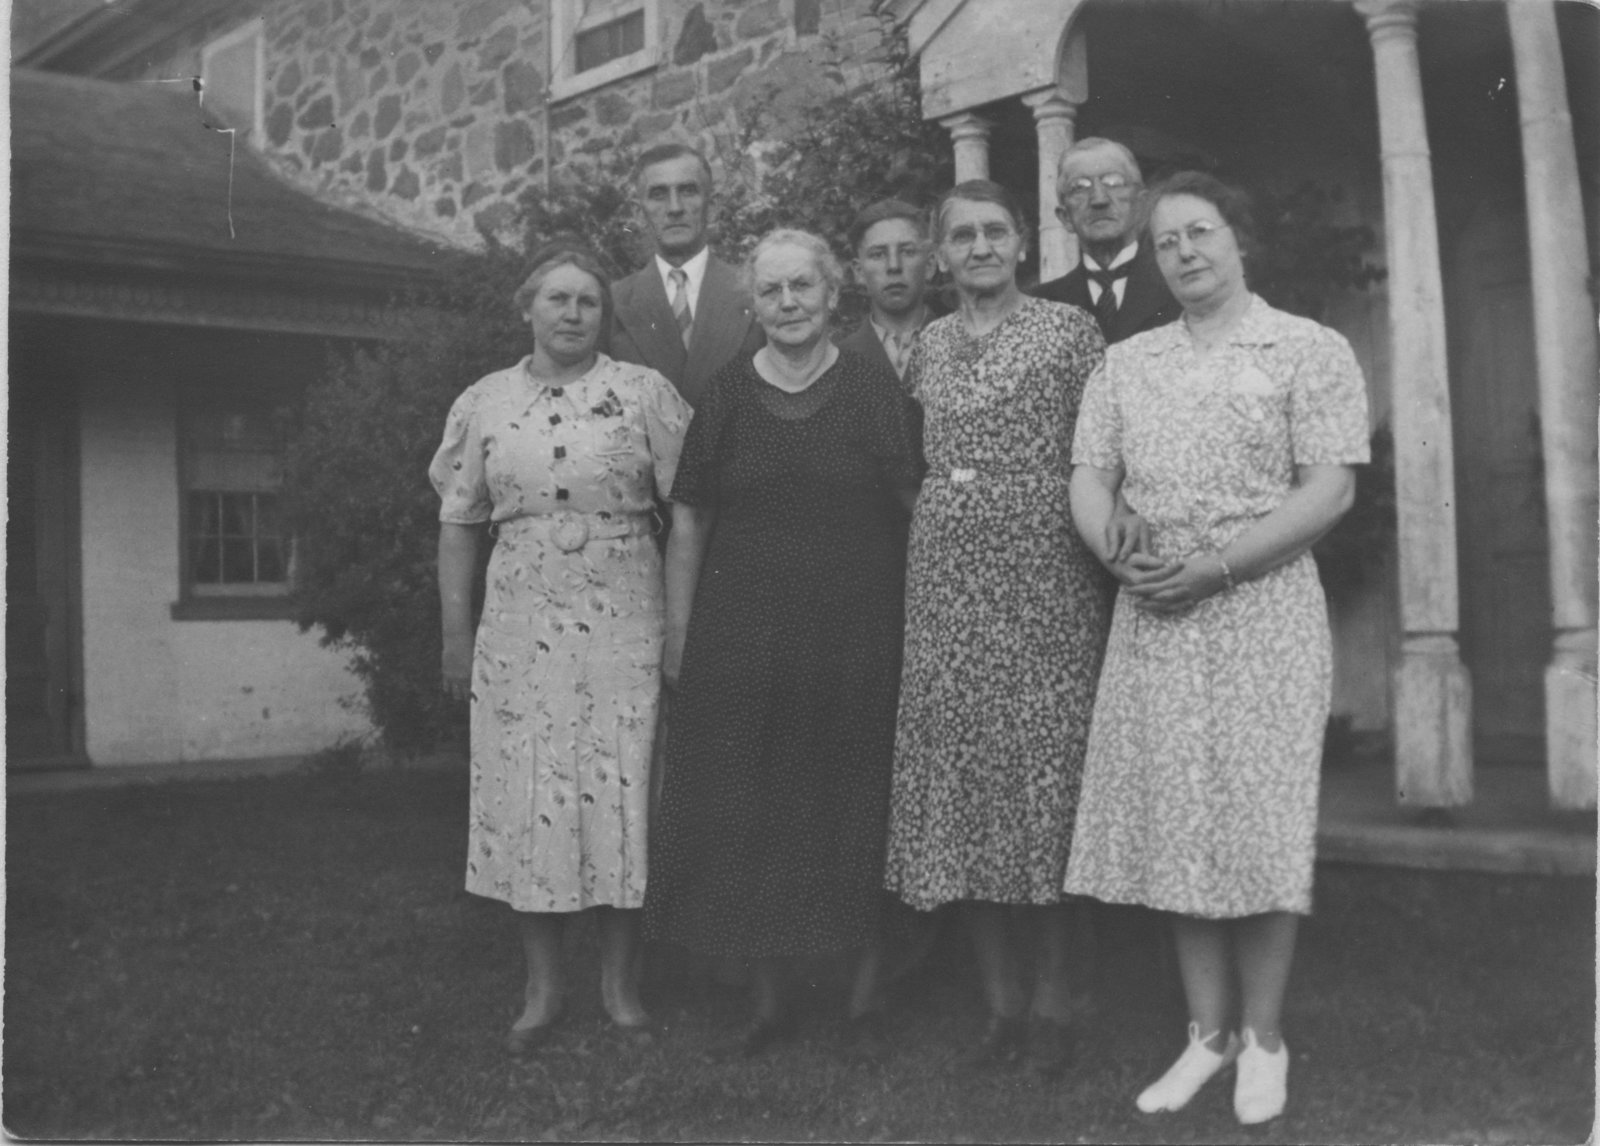 Reverend Conrad Zarnke and family